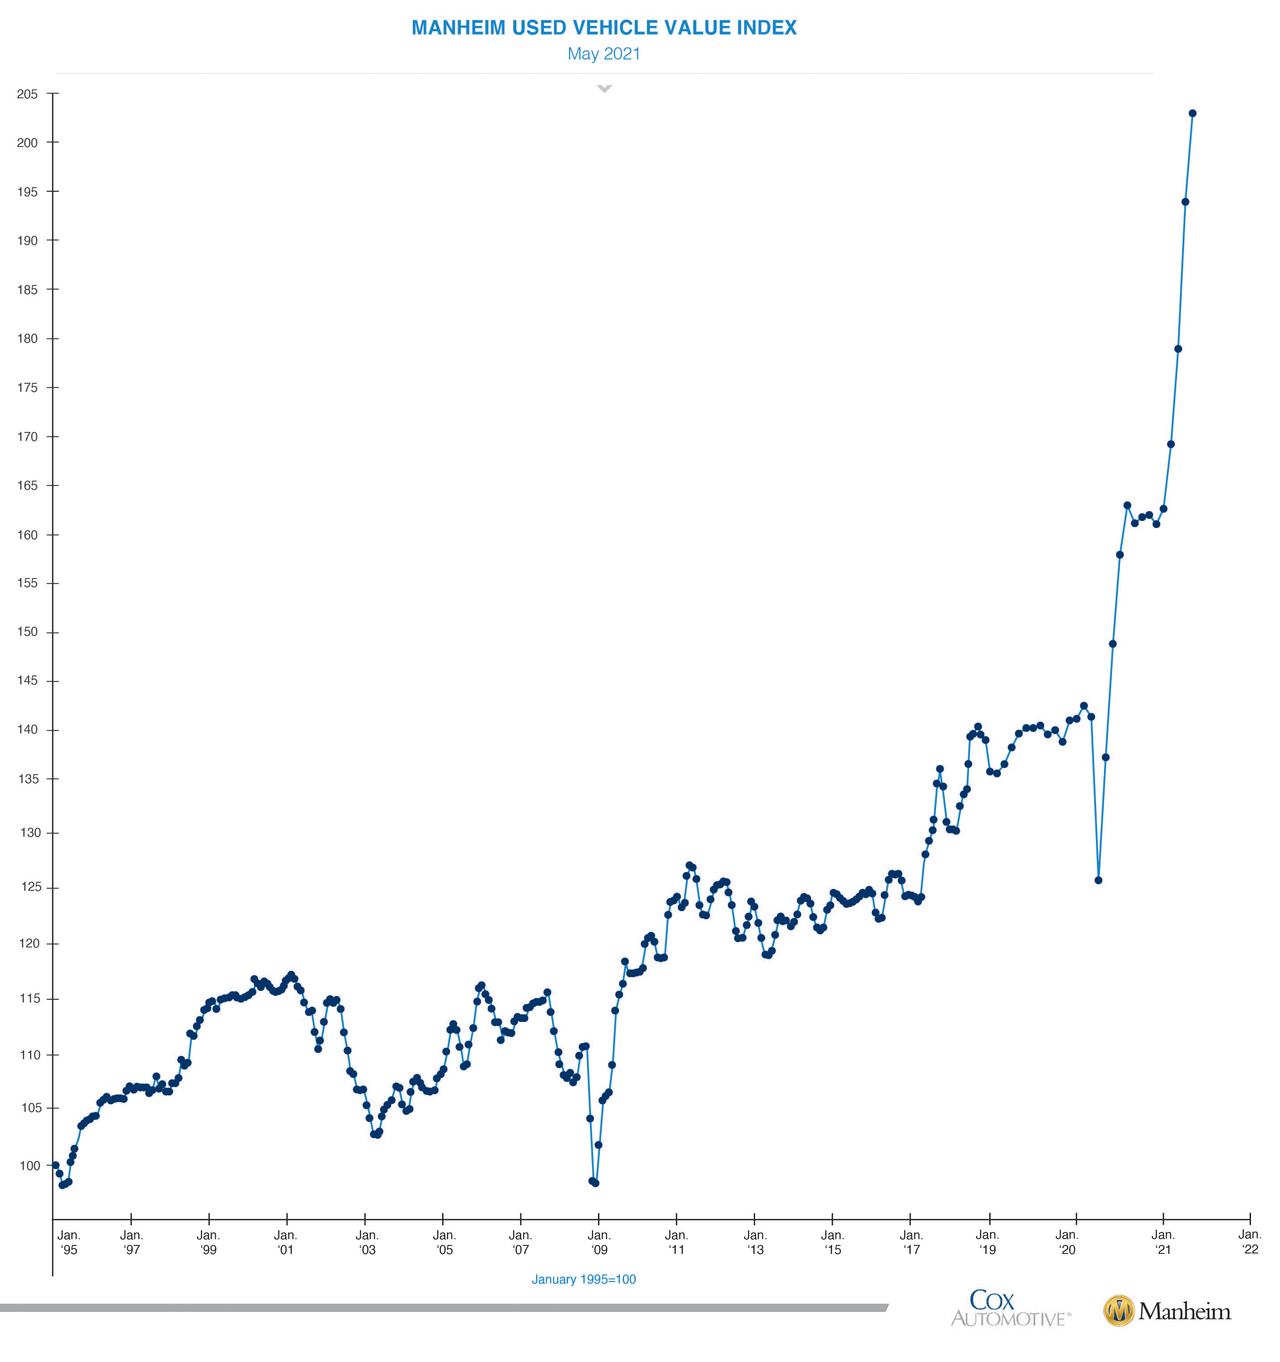 https://cms.zerohedge.com/s3/files/inline-images/ManheimUsedVehicleValueIndex-LineGraph.png?itok=4rsjhstT